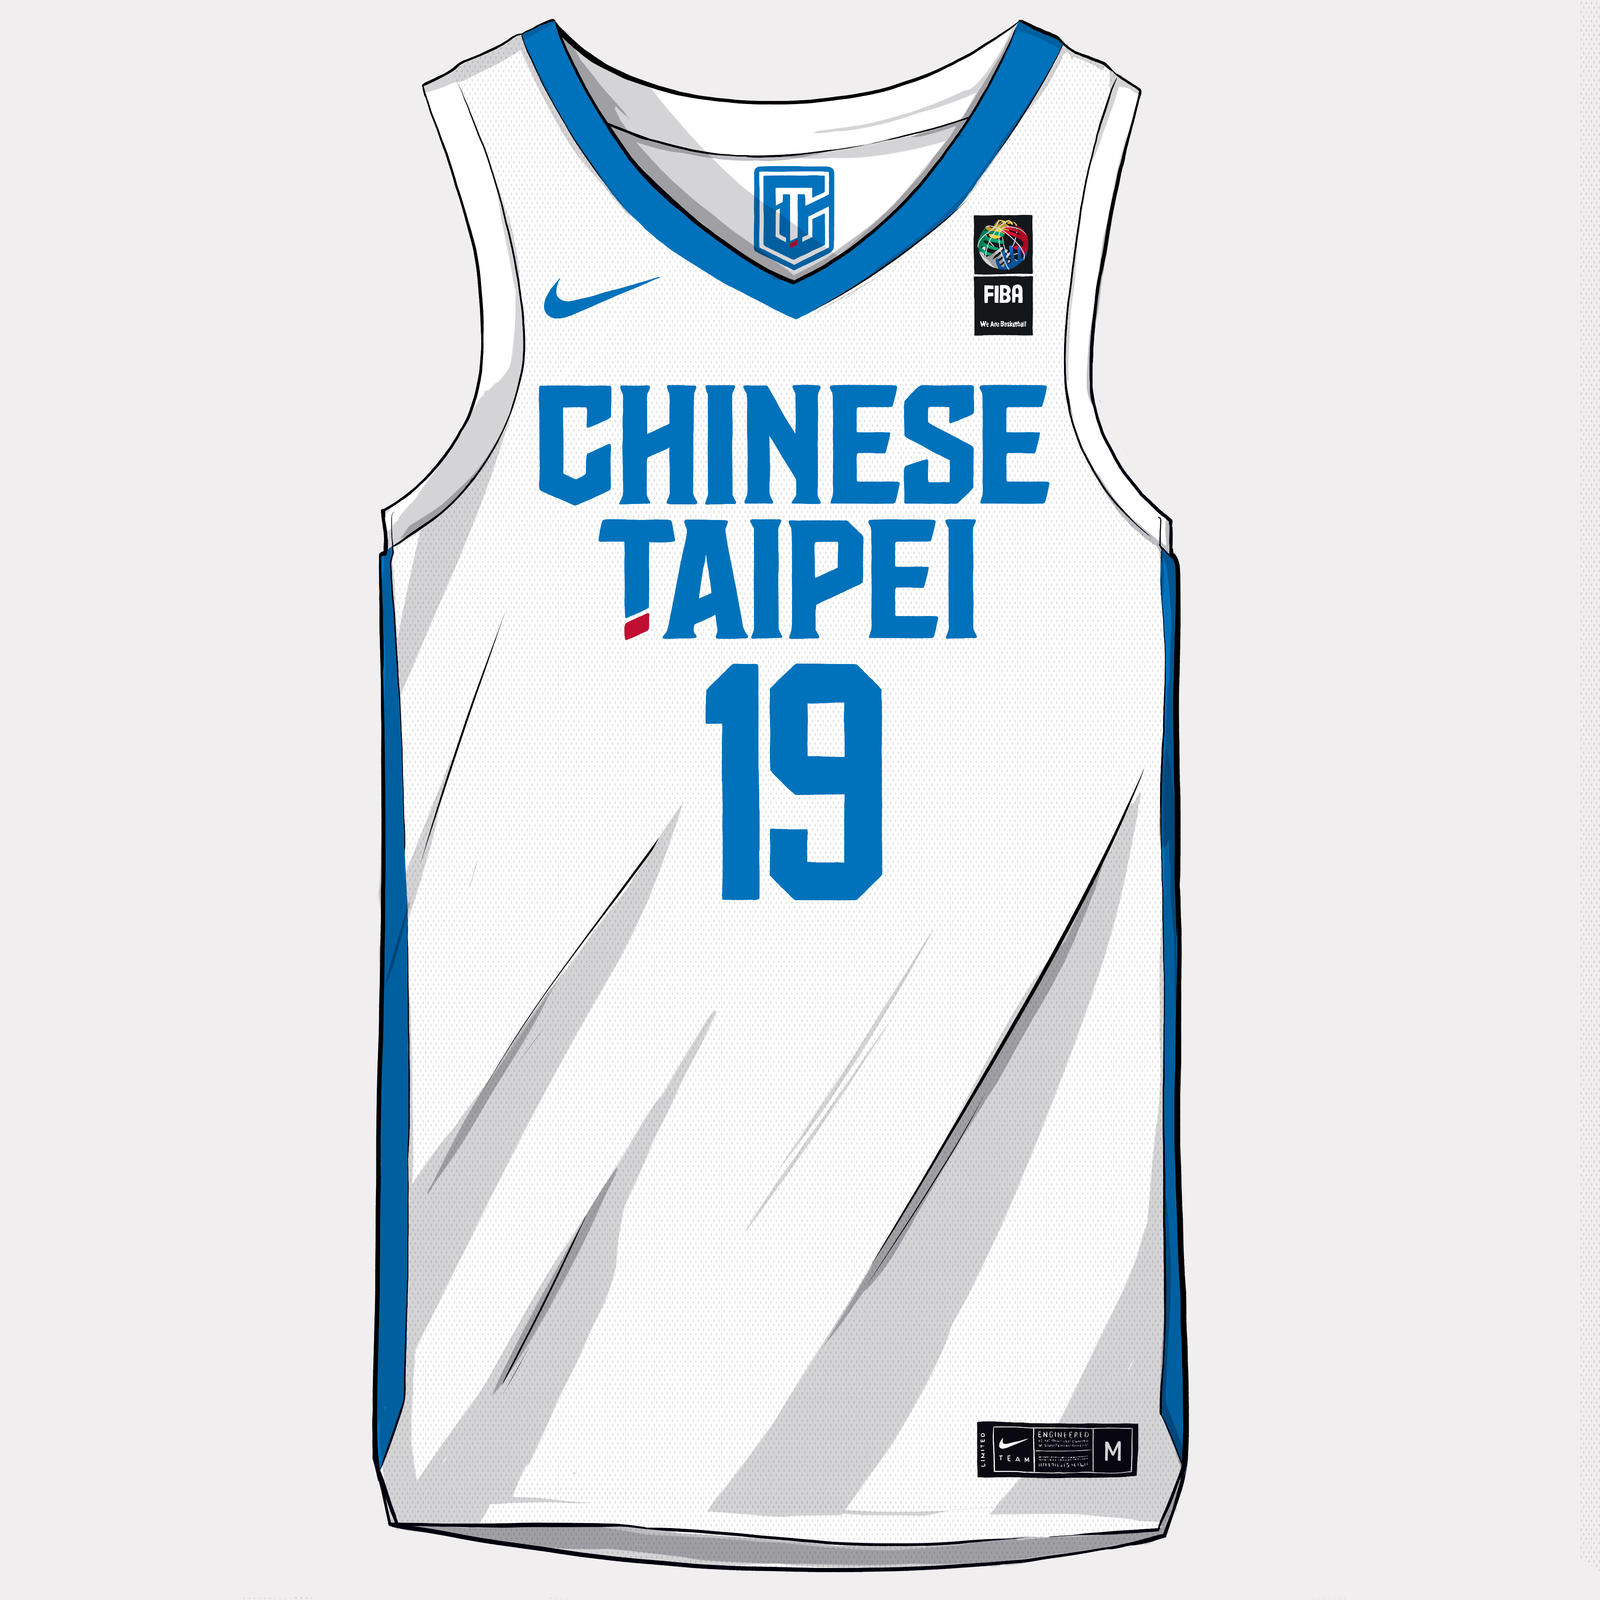 nike-news-chinese-taipei-national-team-kit-2019-illustration-1x1_2_89510.jpg